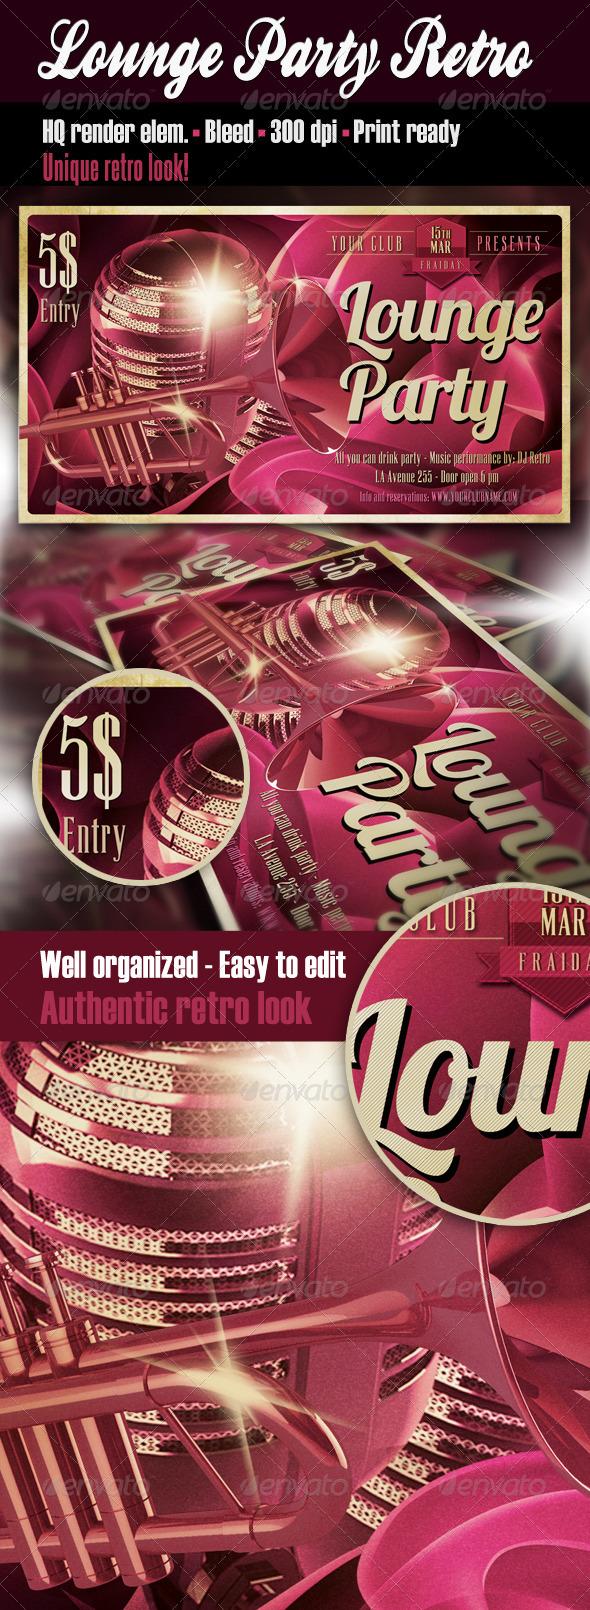 Lounge Party Retro Flyer